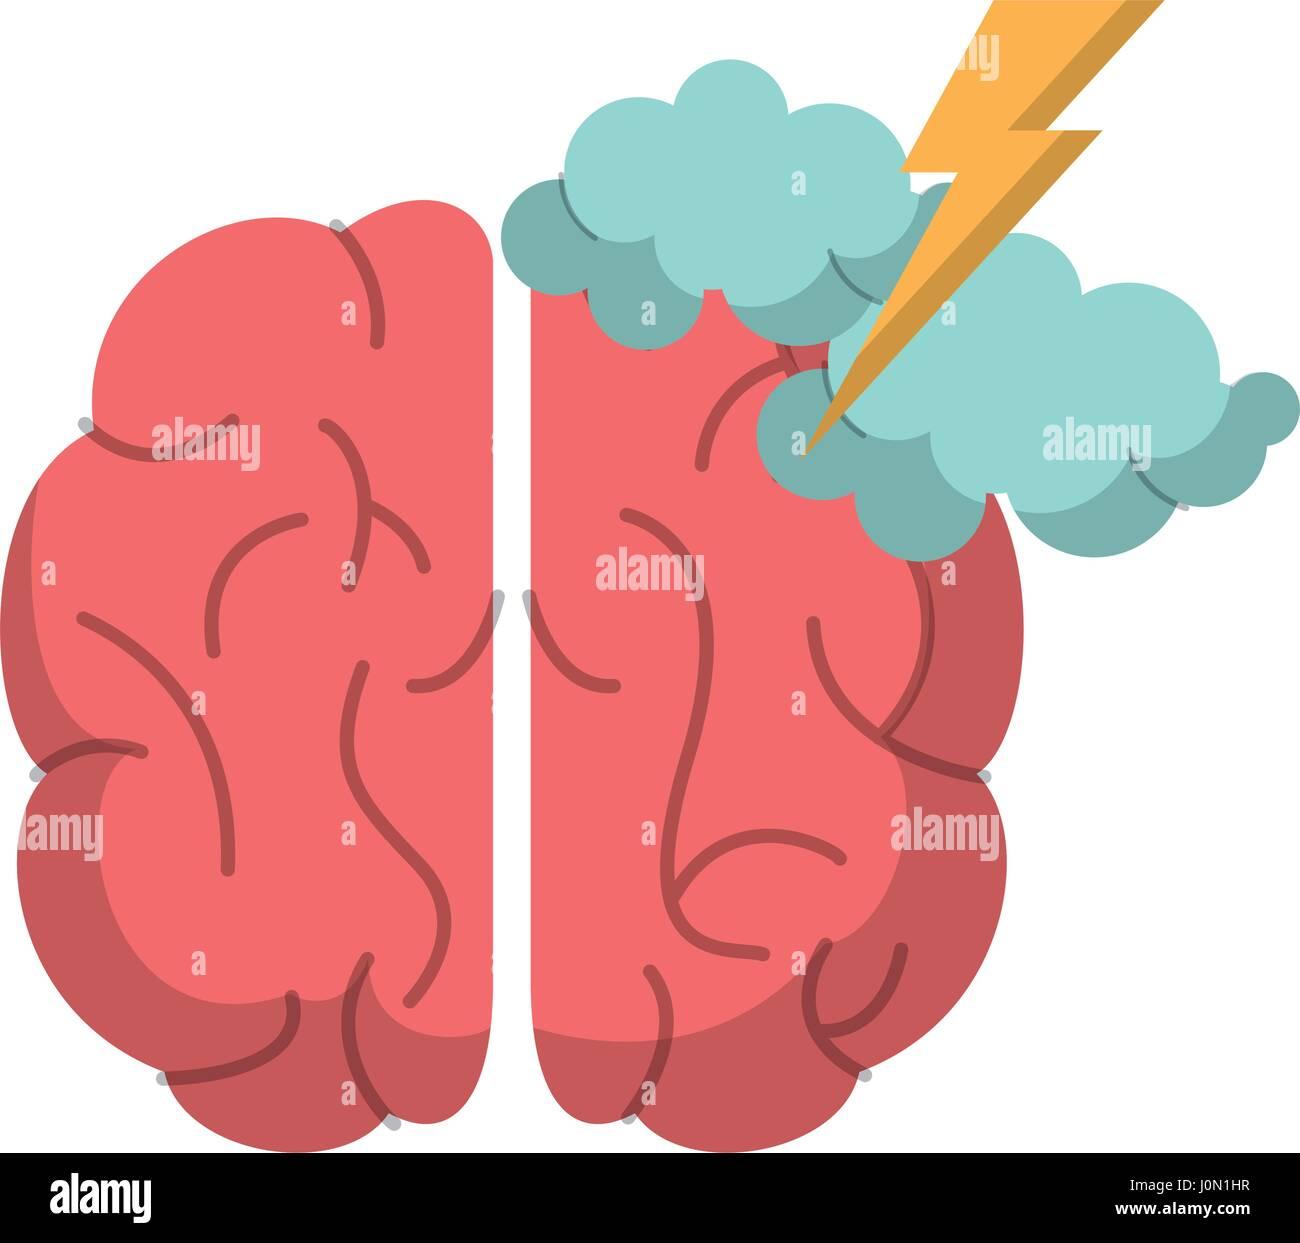 brain creativity storm ideas - Stock Image